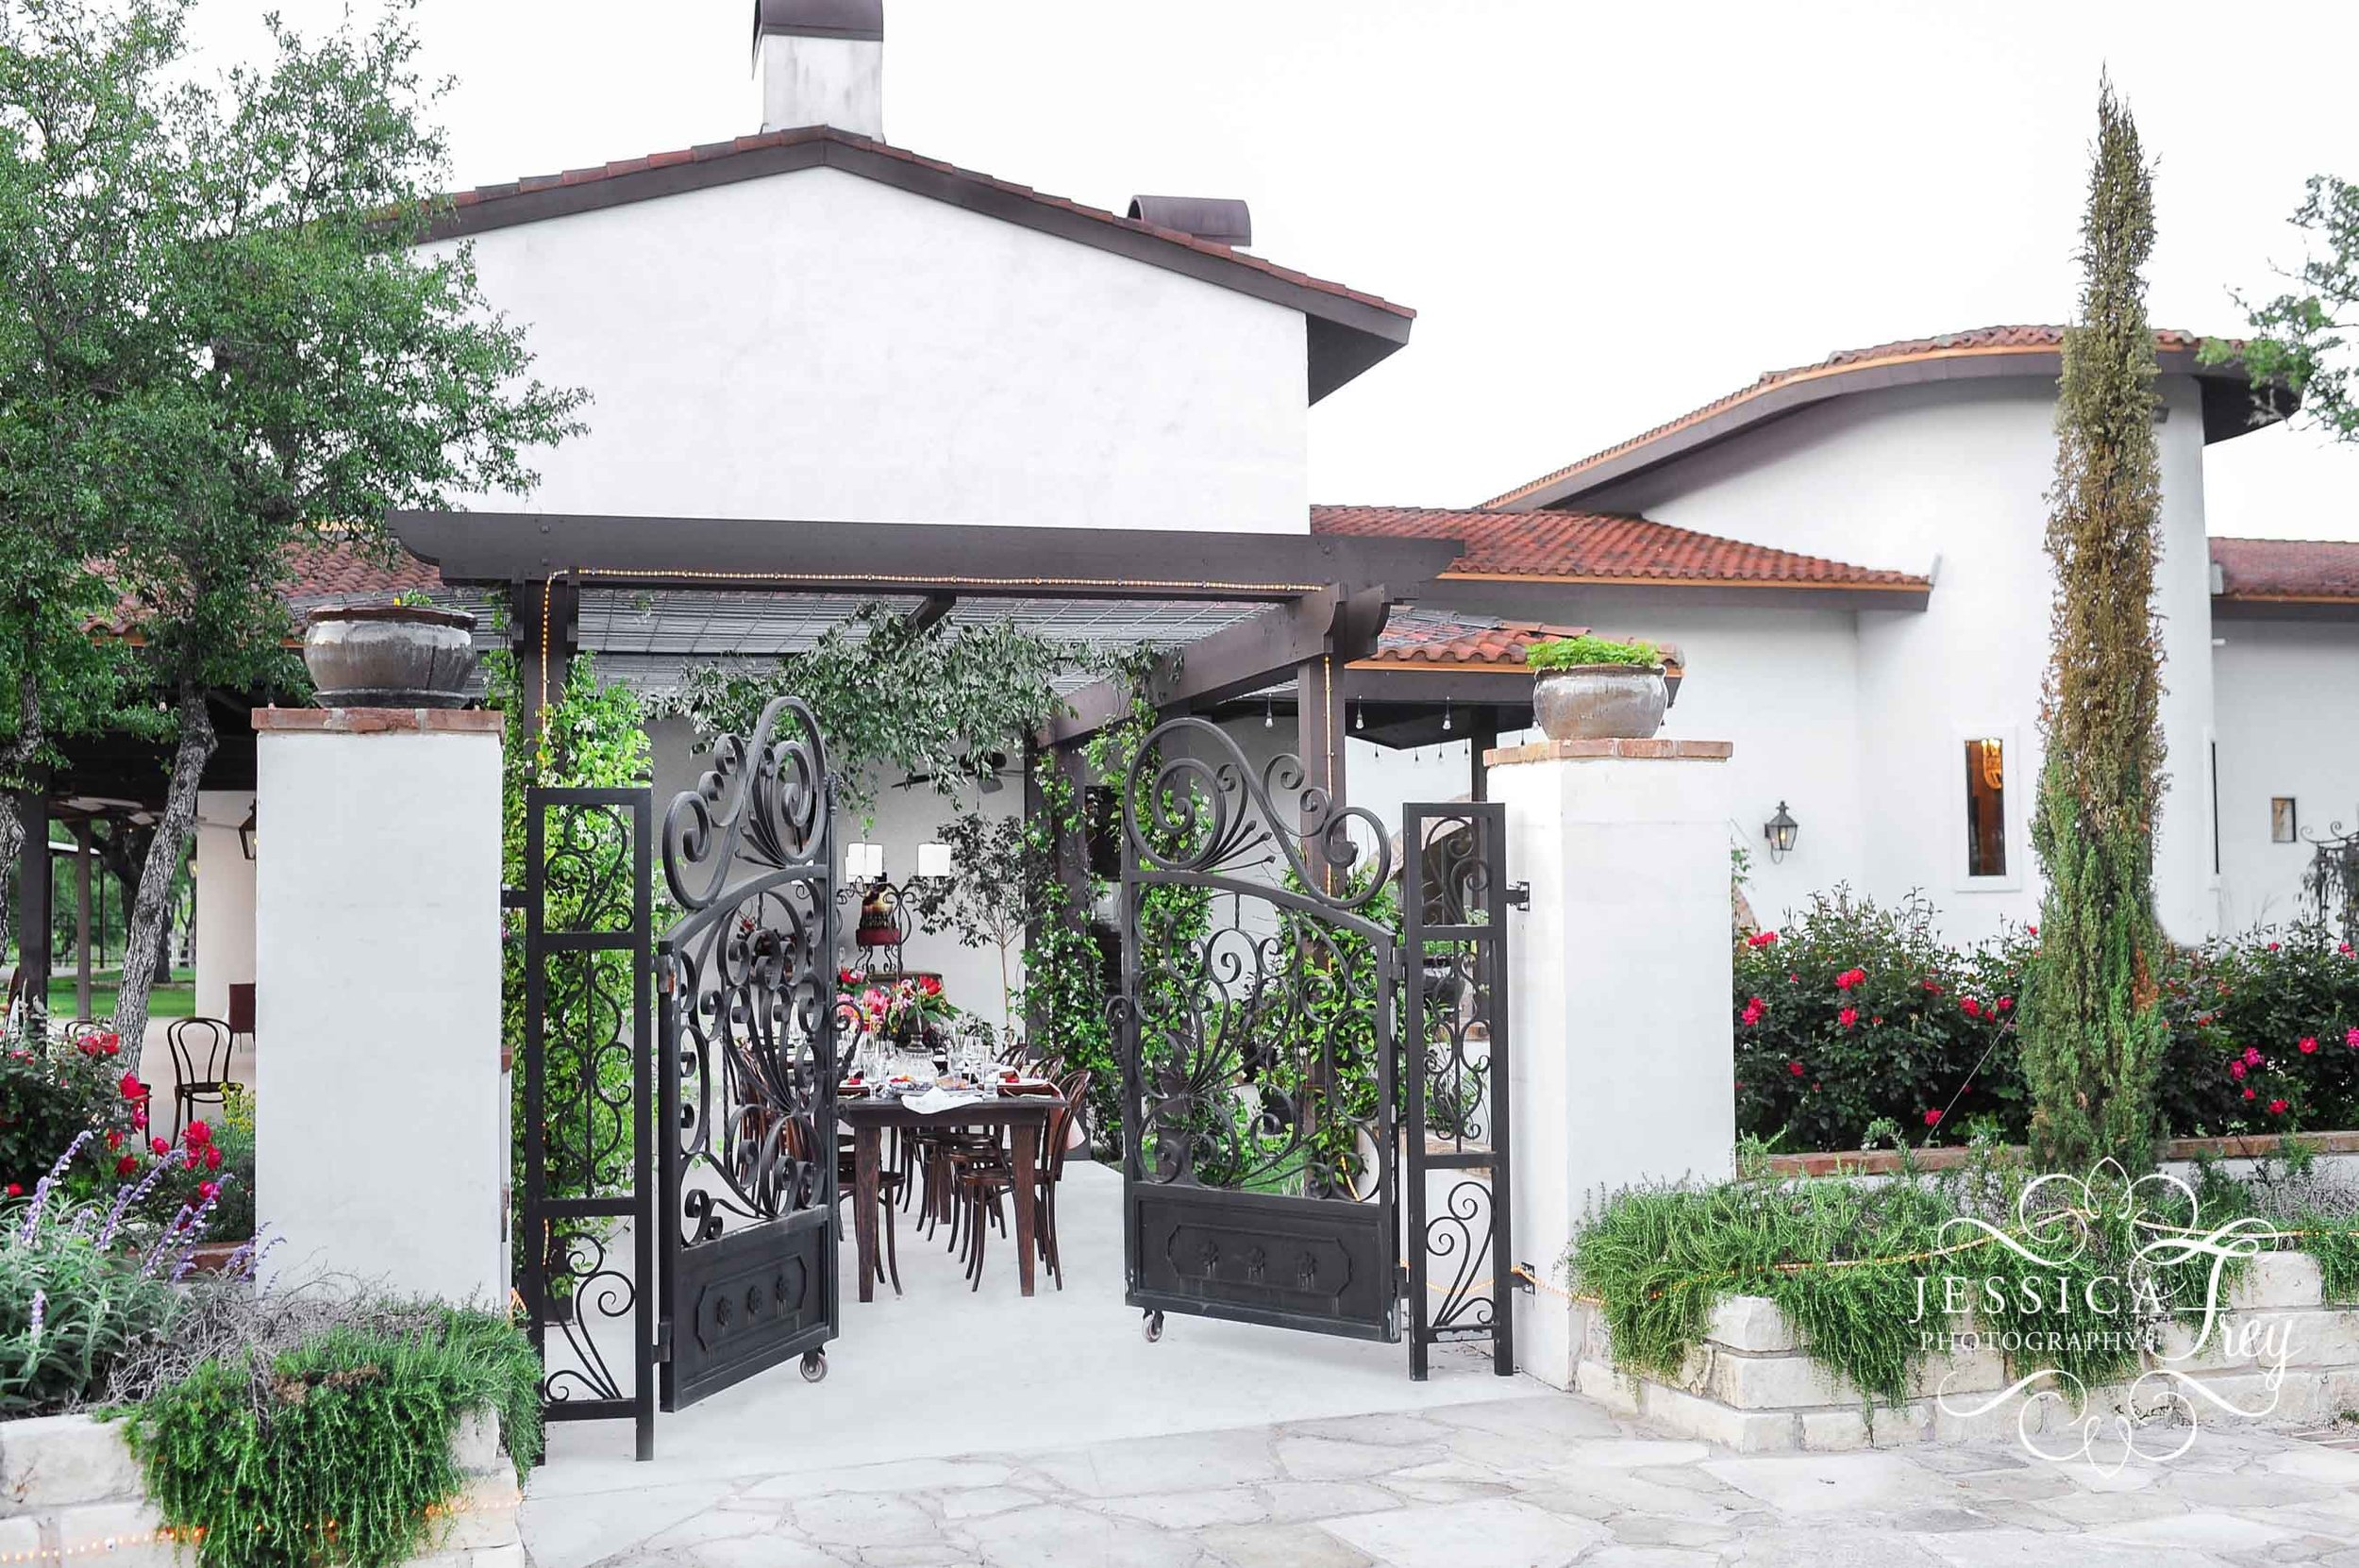 Garden-Grove-Spanish-Wedding-jessicafreyphotography-sm-093.jpg